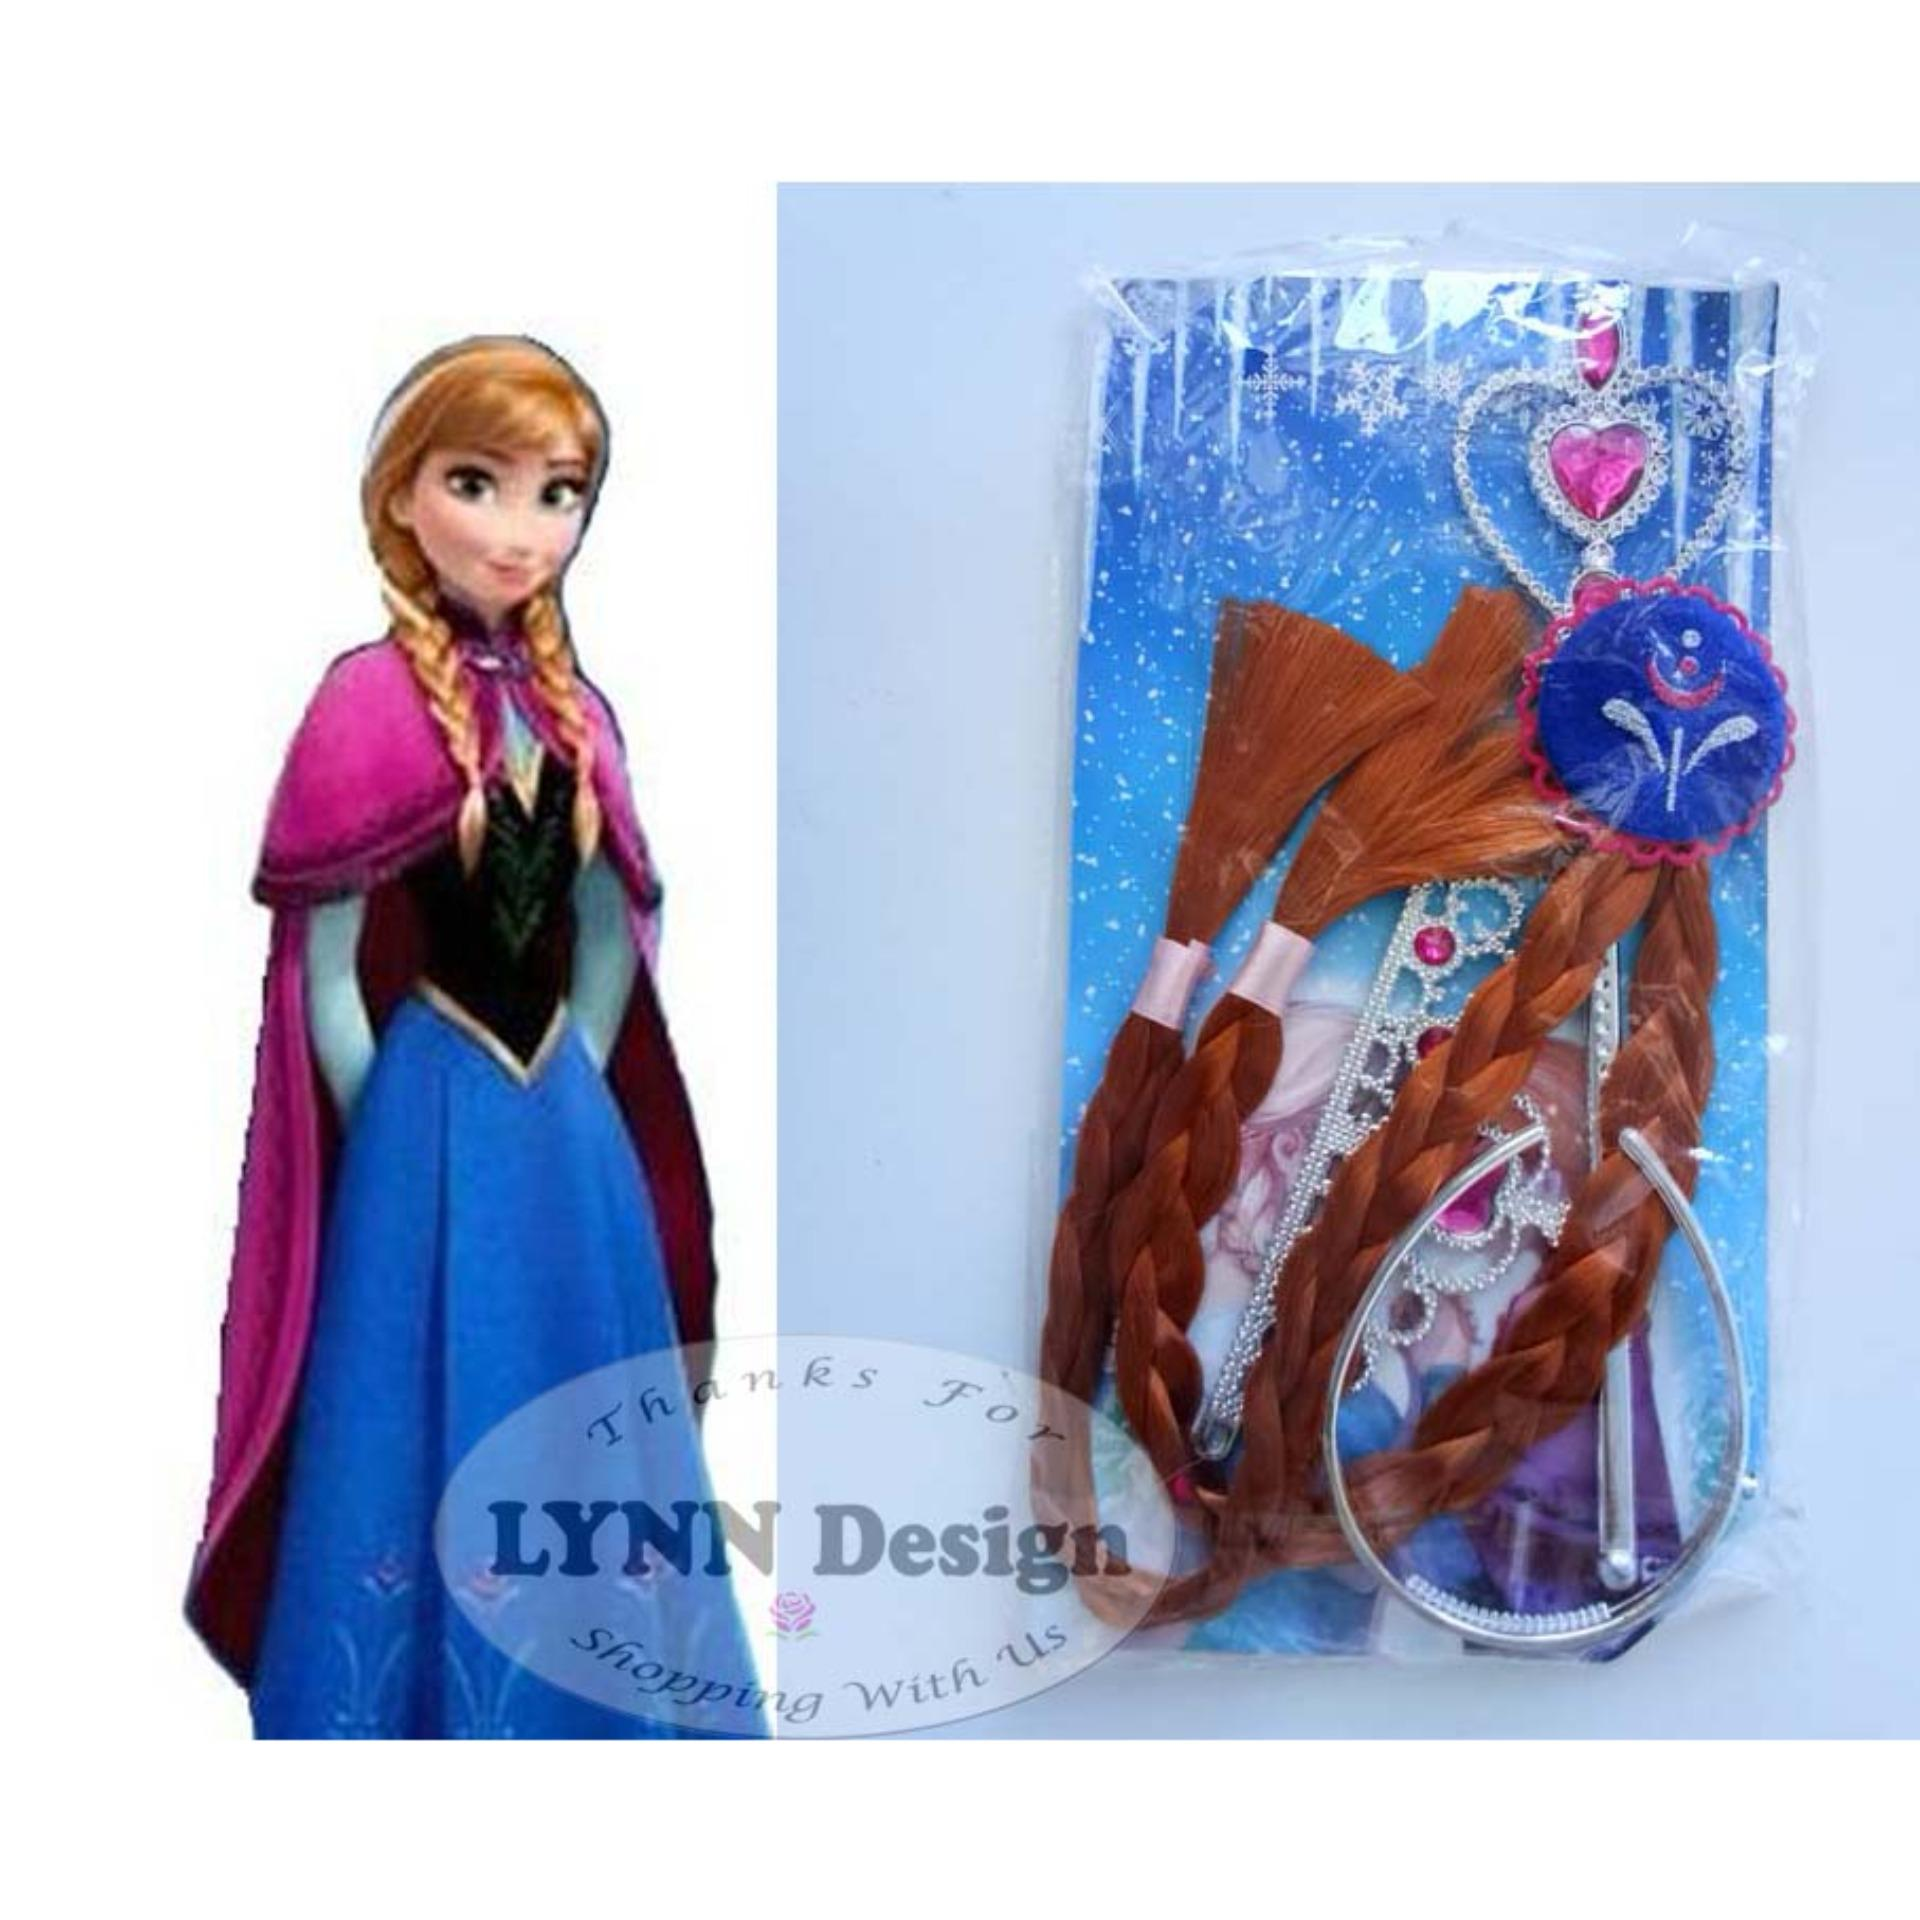 Lynn Design - Frozen Elsa aksesoris Anna aksesoris 3 in 1 a97b737ddb